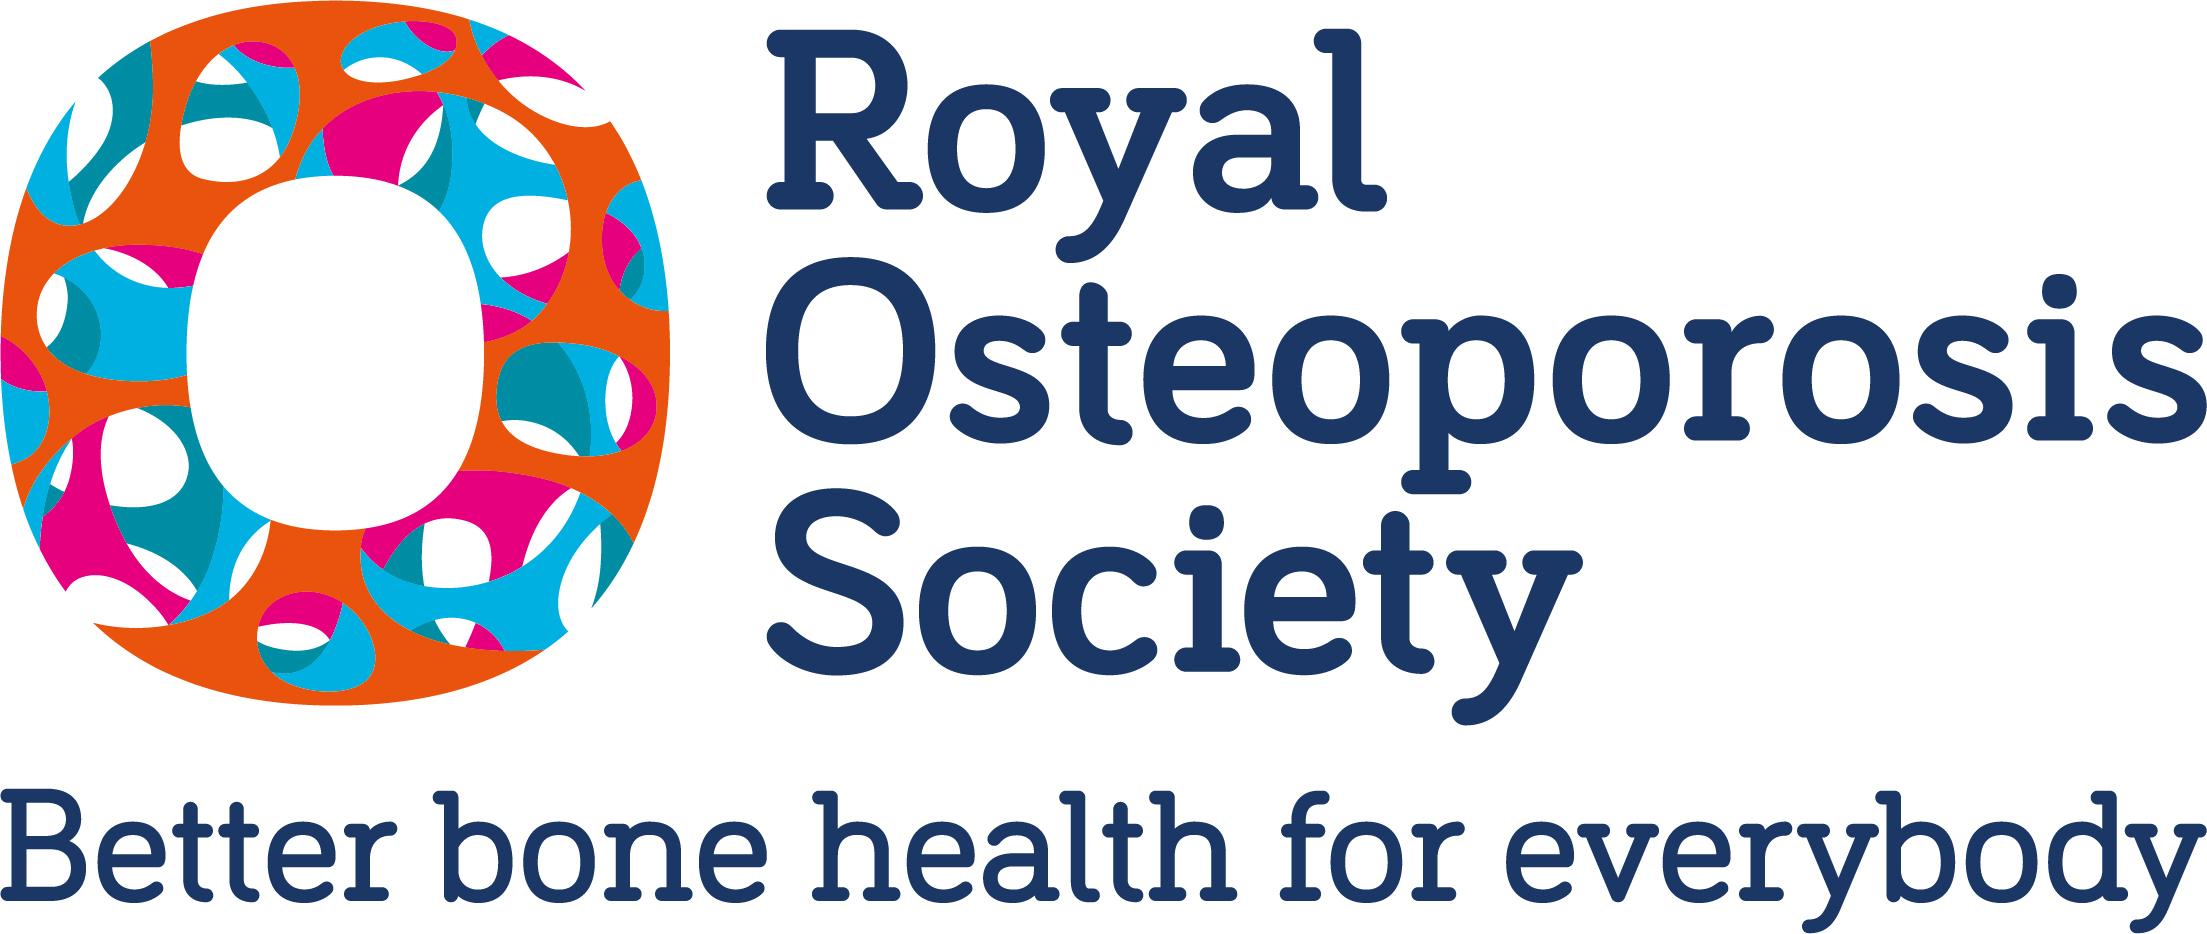 National Osteoporosis Society